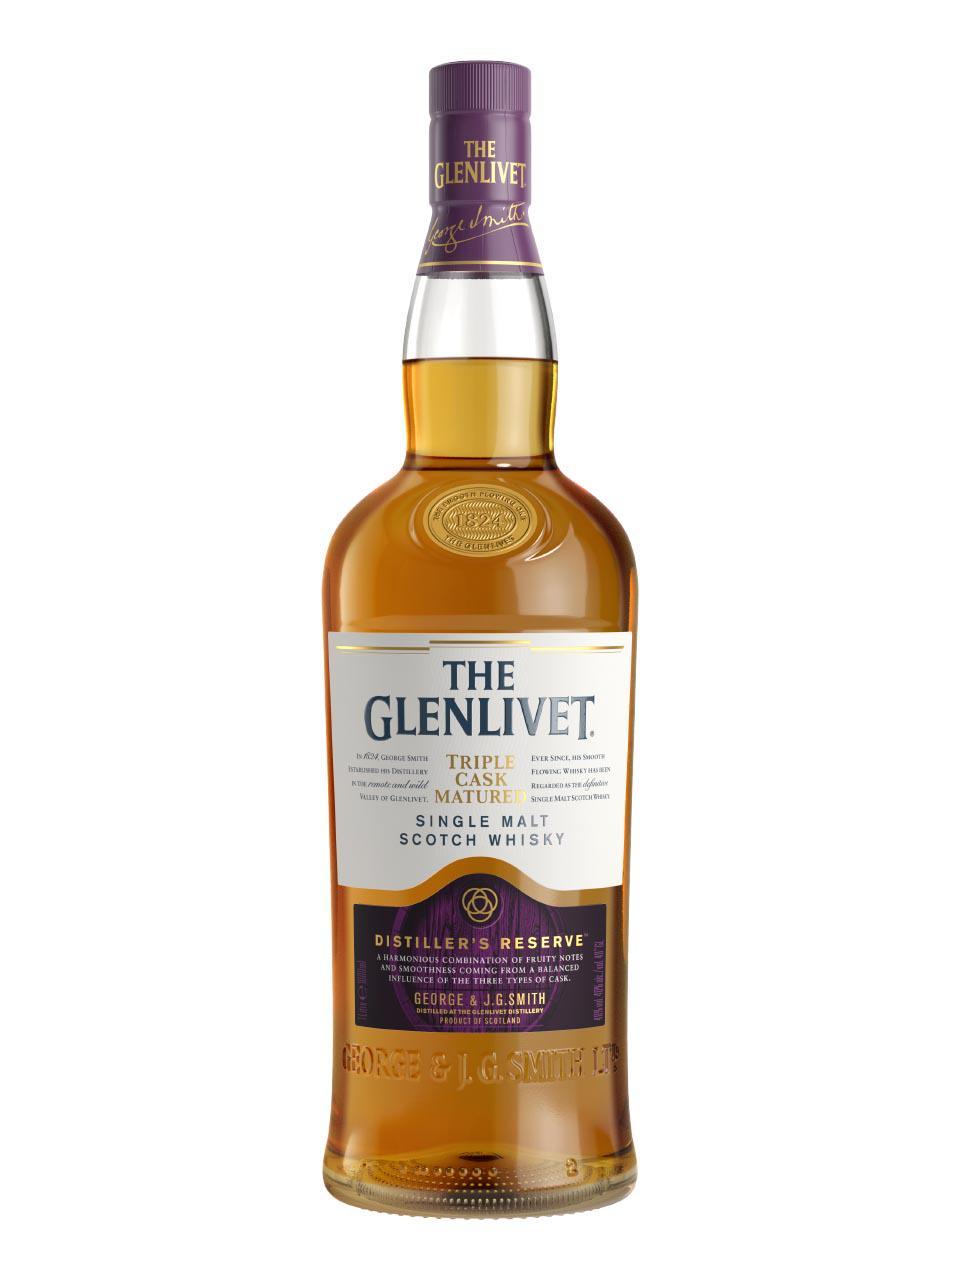 Glenlivet 三桶熟成蒸餾廠珍藏威士忌 40 度 1L | 法蘭克福機場網上購物